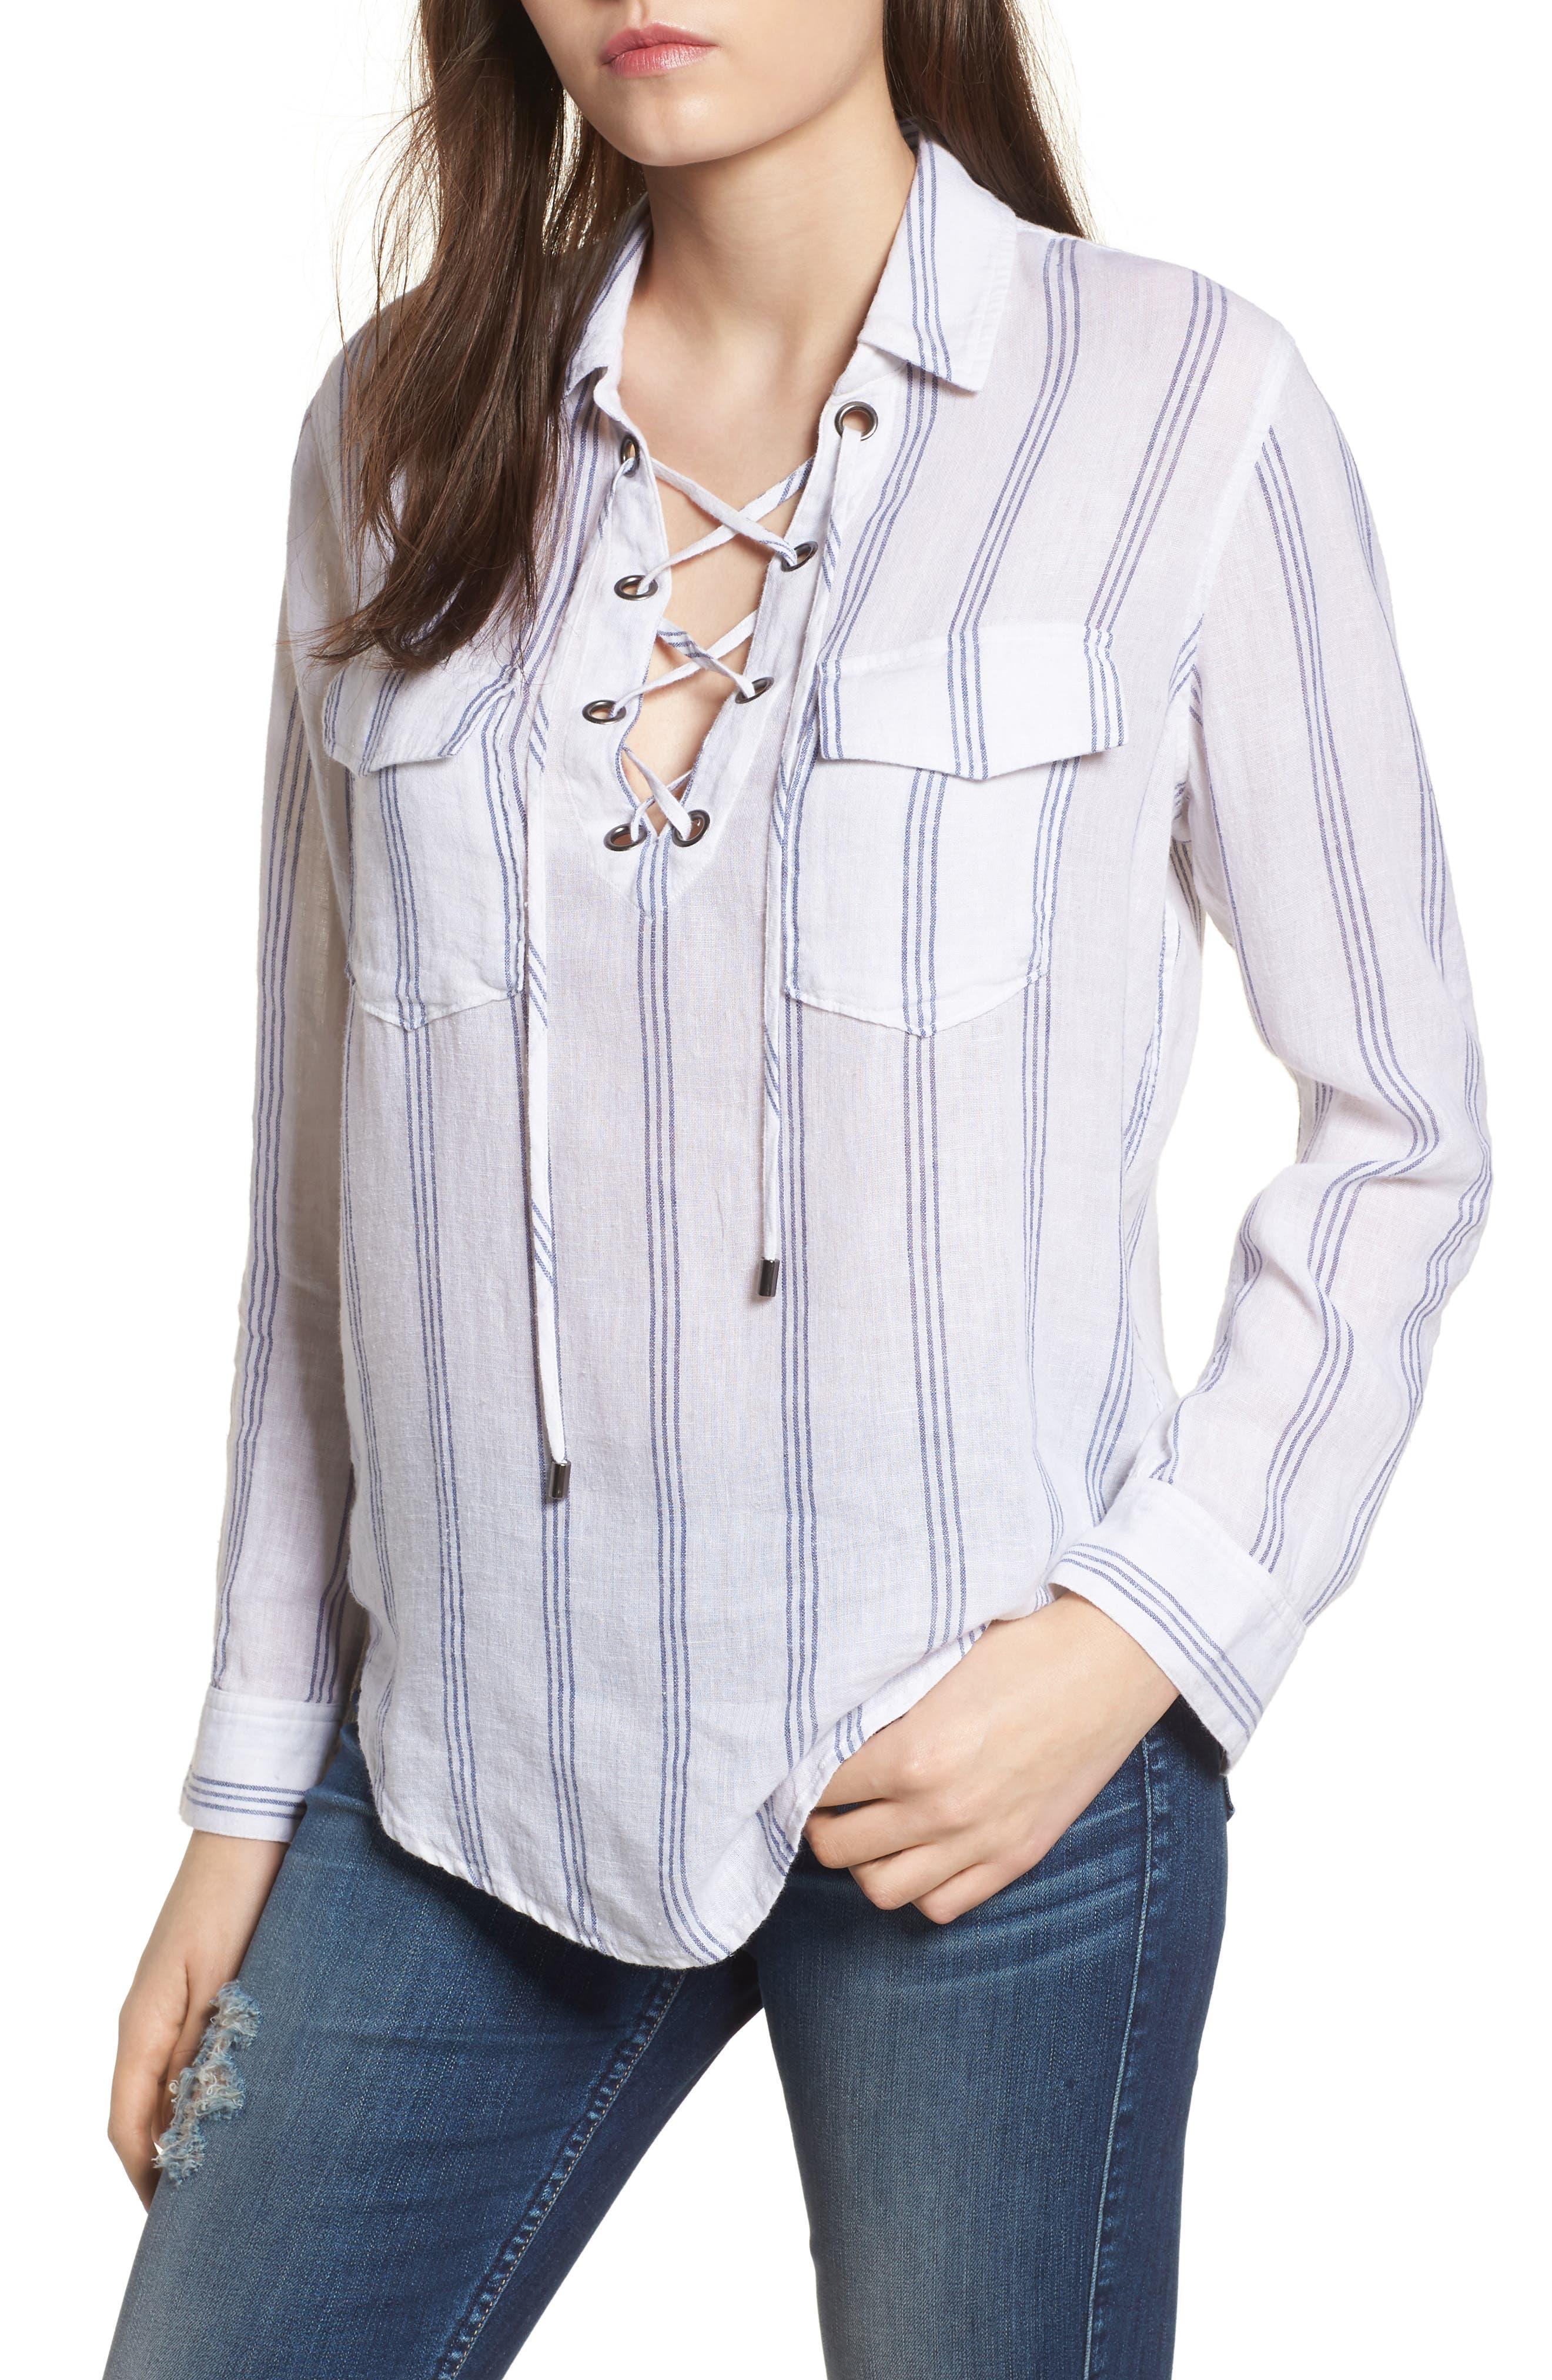 Matea Stripe Lace-Up Top, Main, color, 142